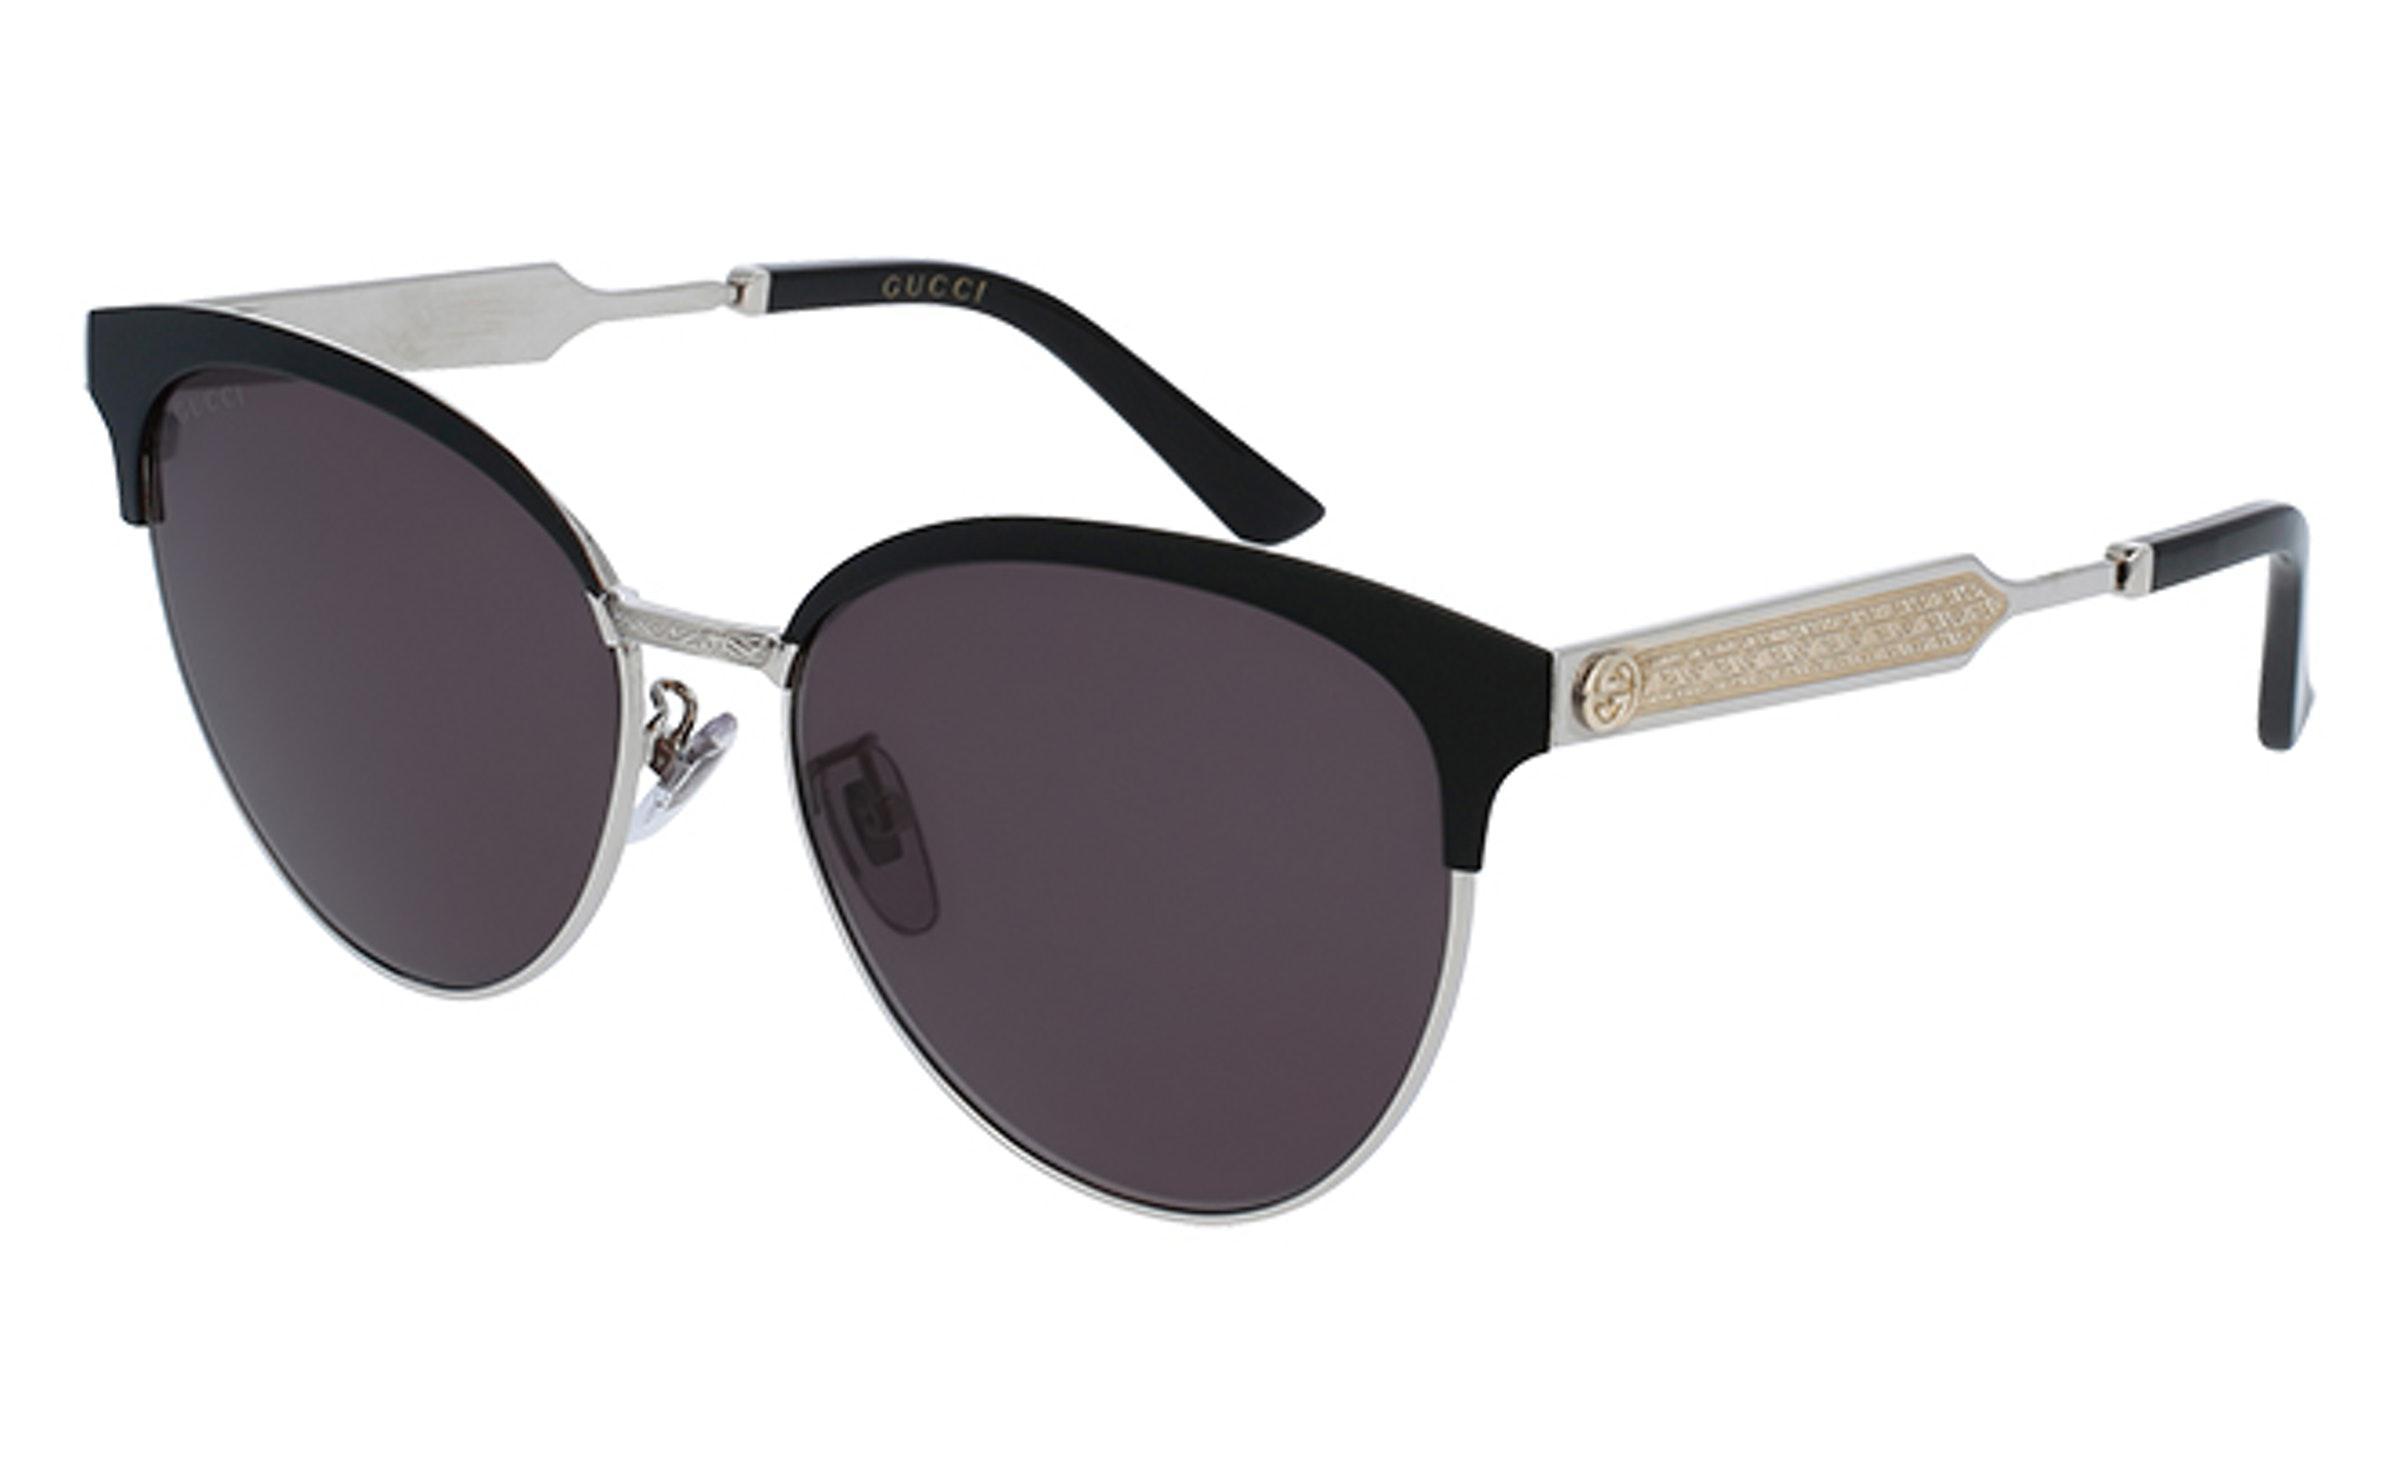 2efa97e5817 Lyst - Gucci Gg 0074 Cat Eye Sunglasses in Black